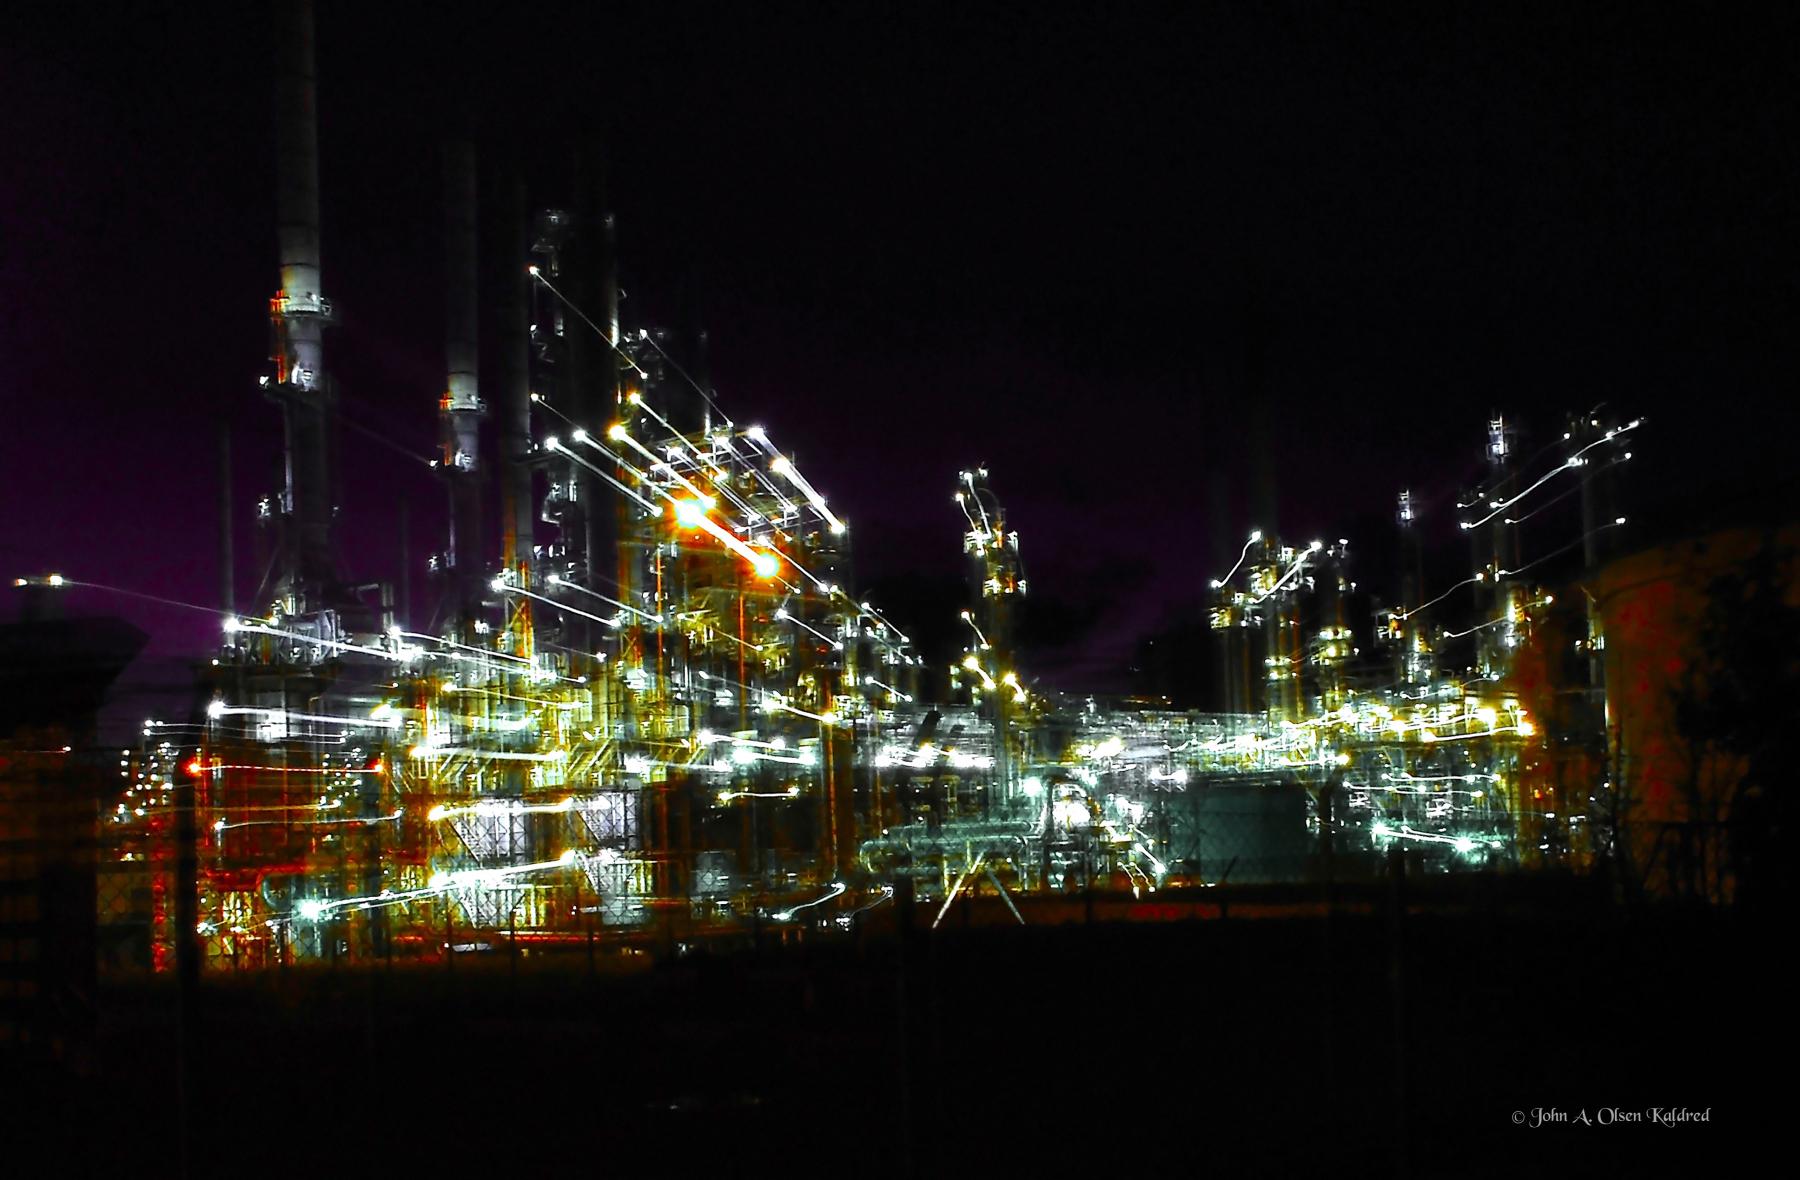 Statoil ved aften_01